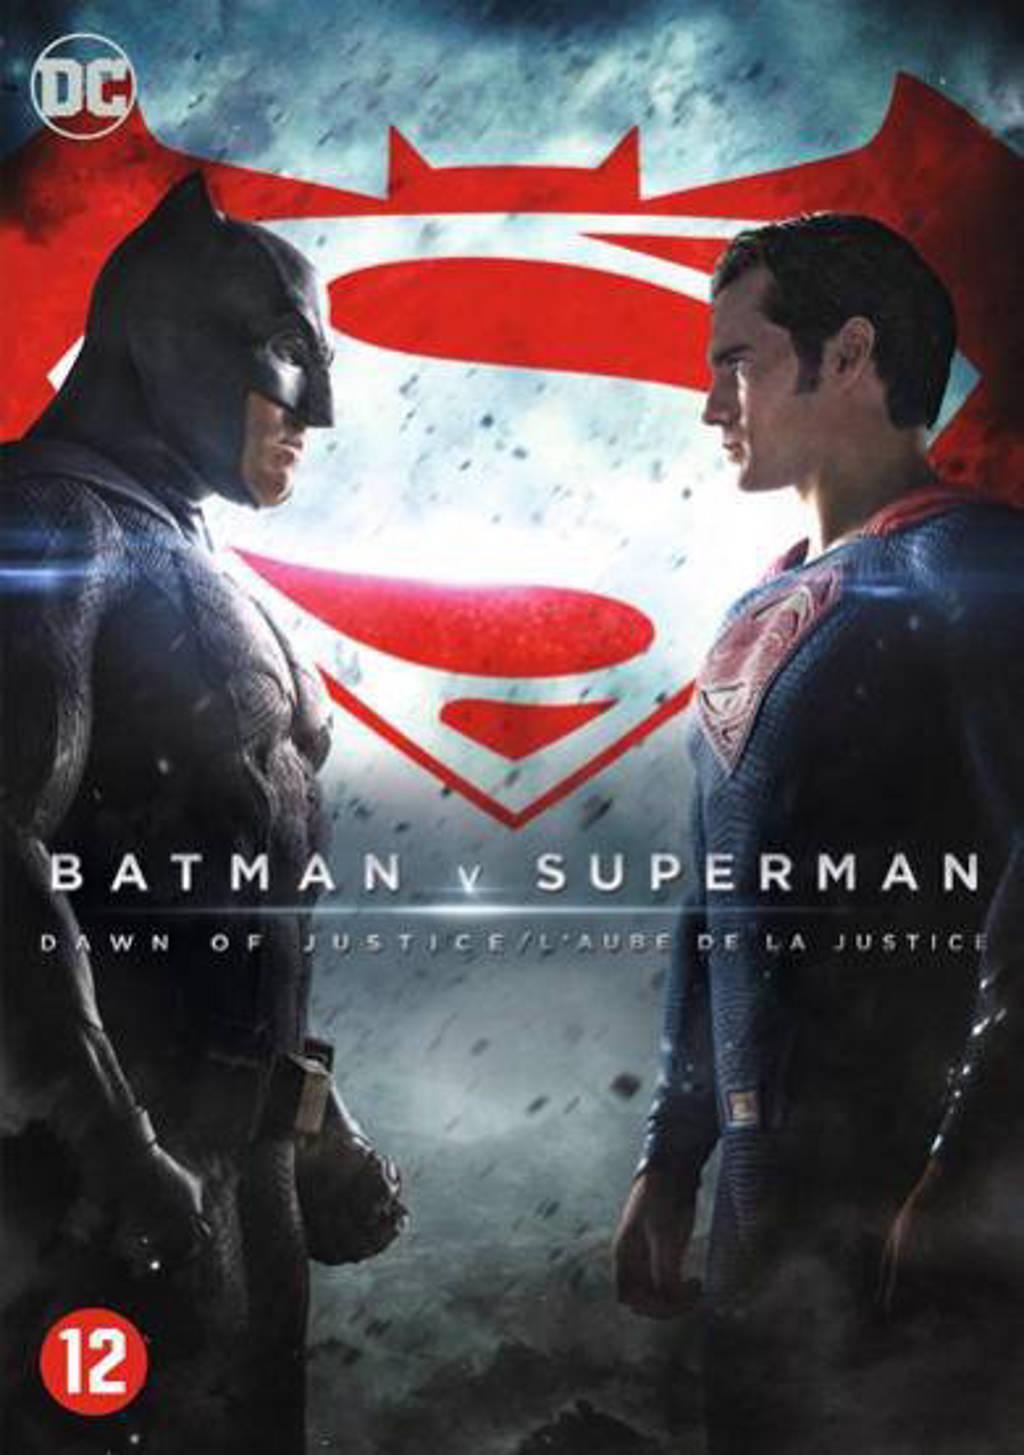 Batman v Superman - Dawn of justice (DVD)